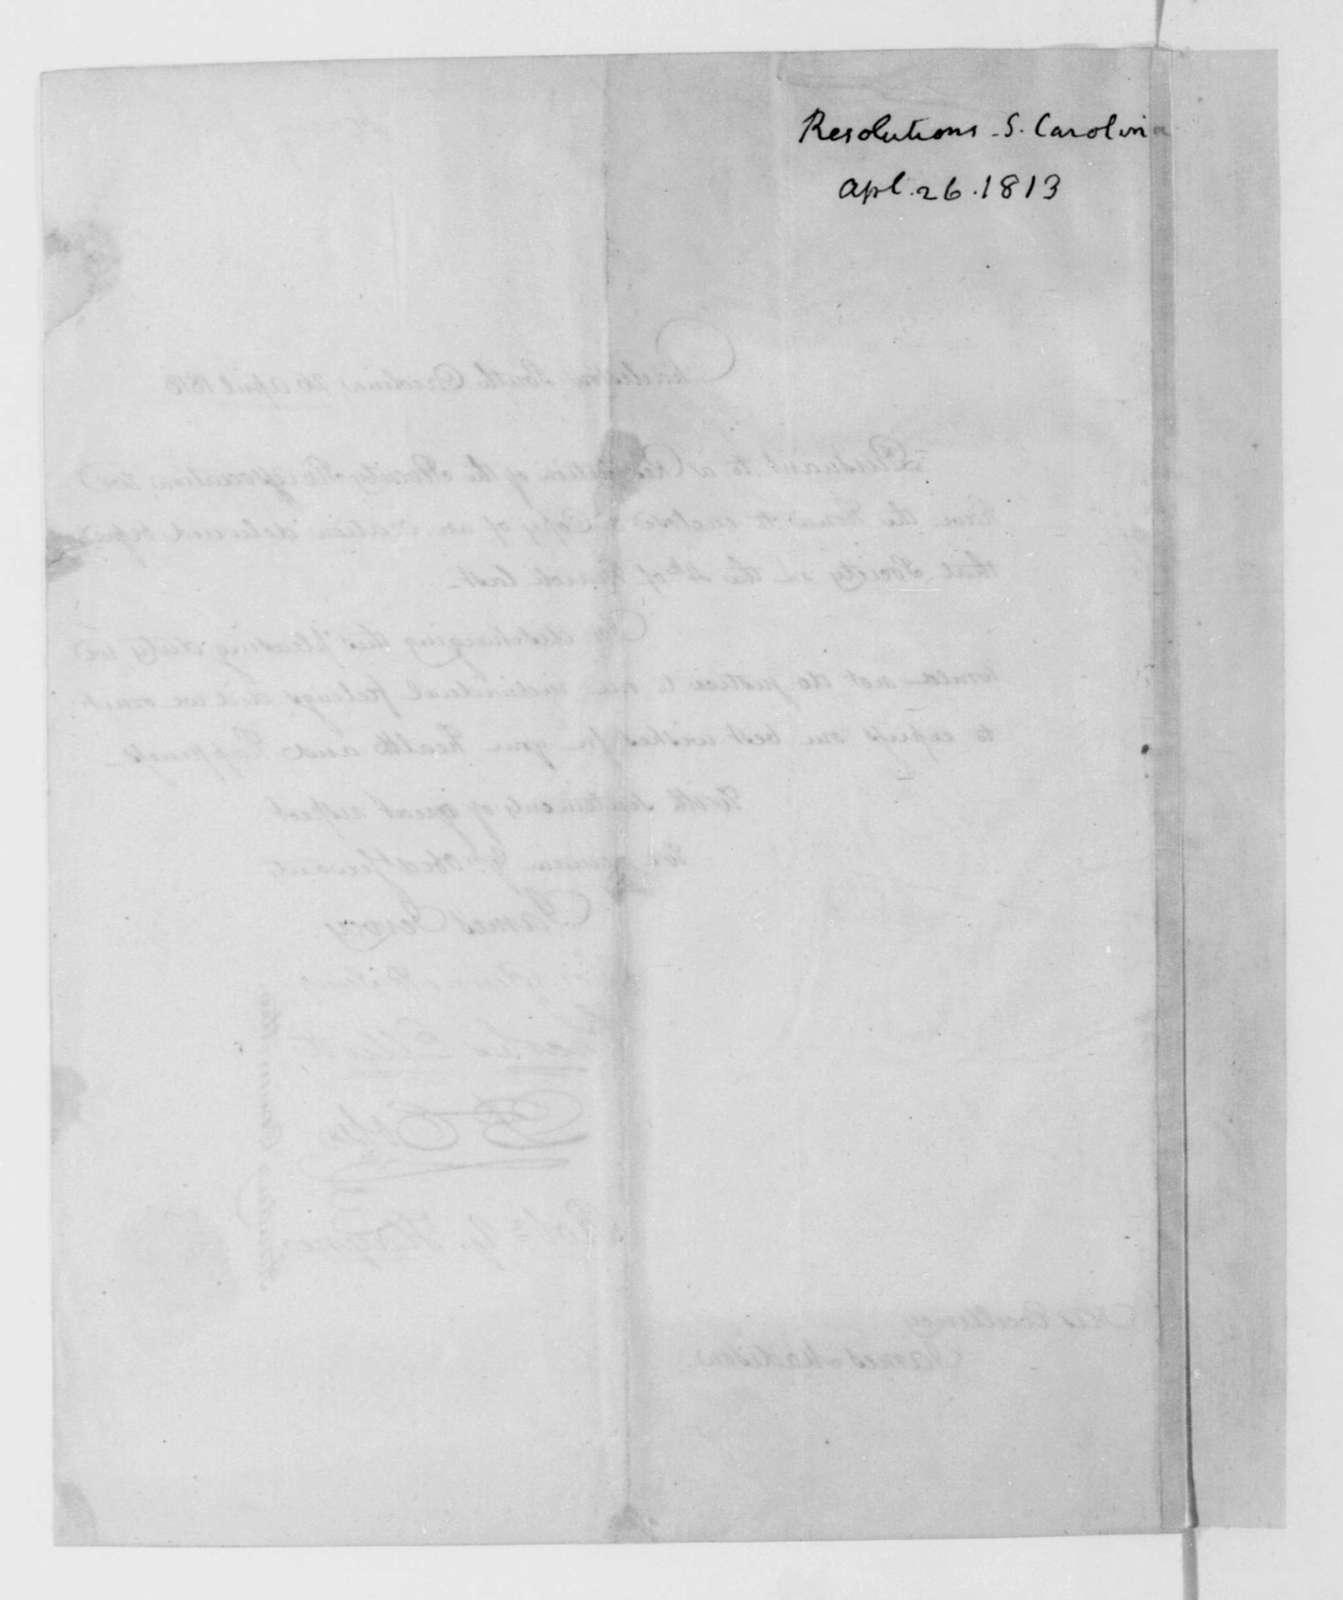 James Jervey to James Madison, April 26, 1813. Transmittal.